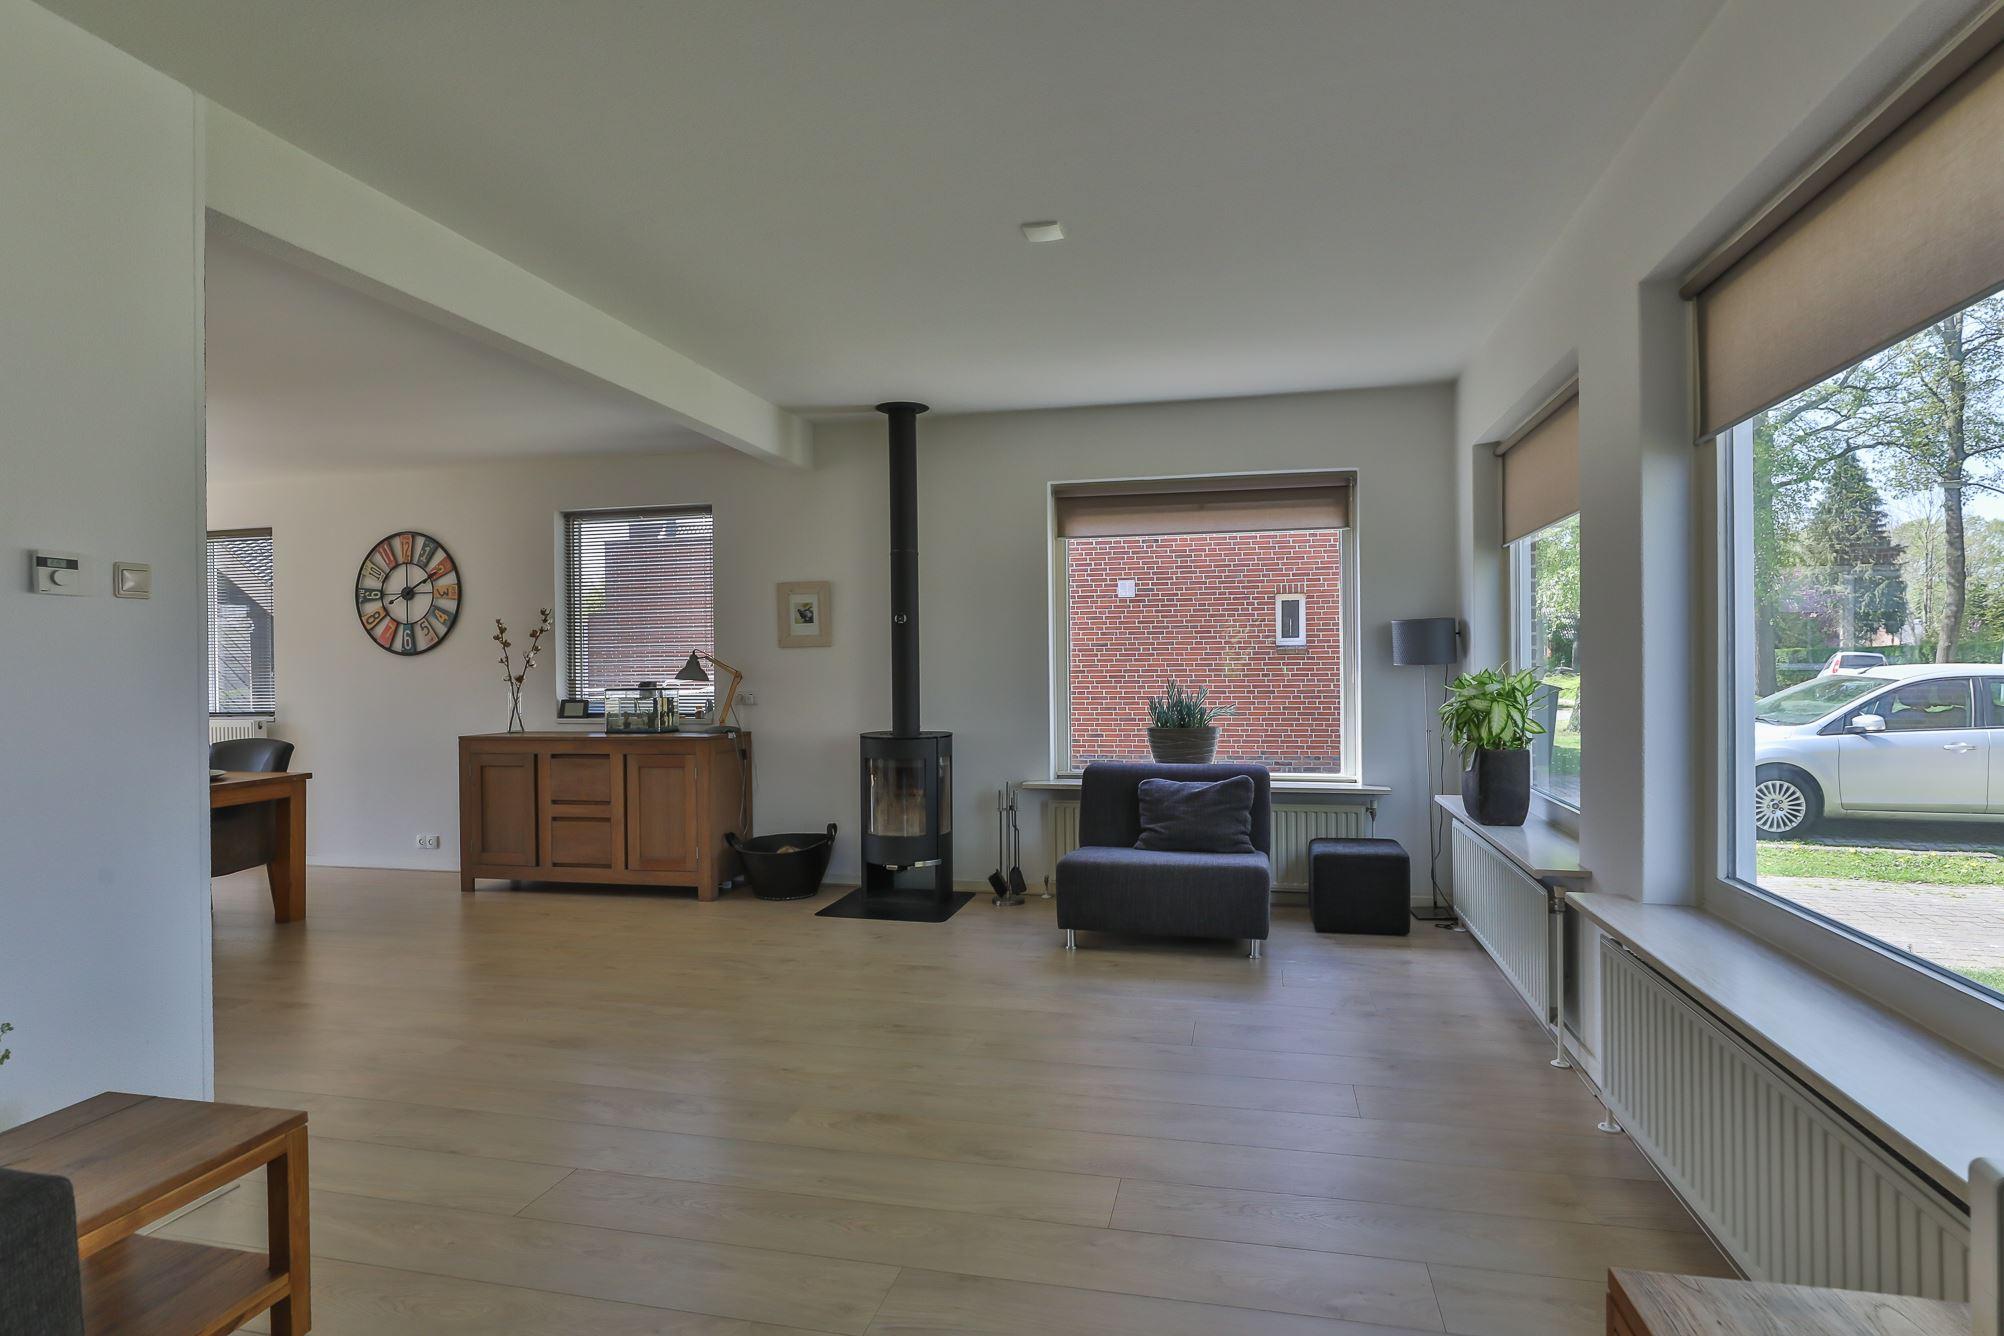 Huis te koop: Dorpshuisweg 2 9617 BN Harkstede (Gem ...